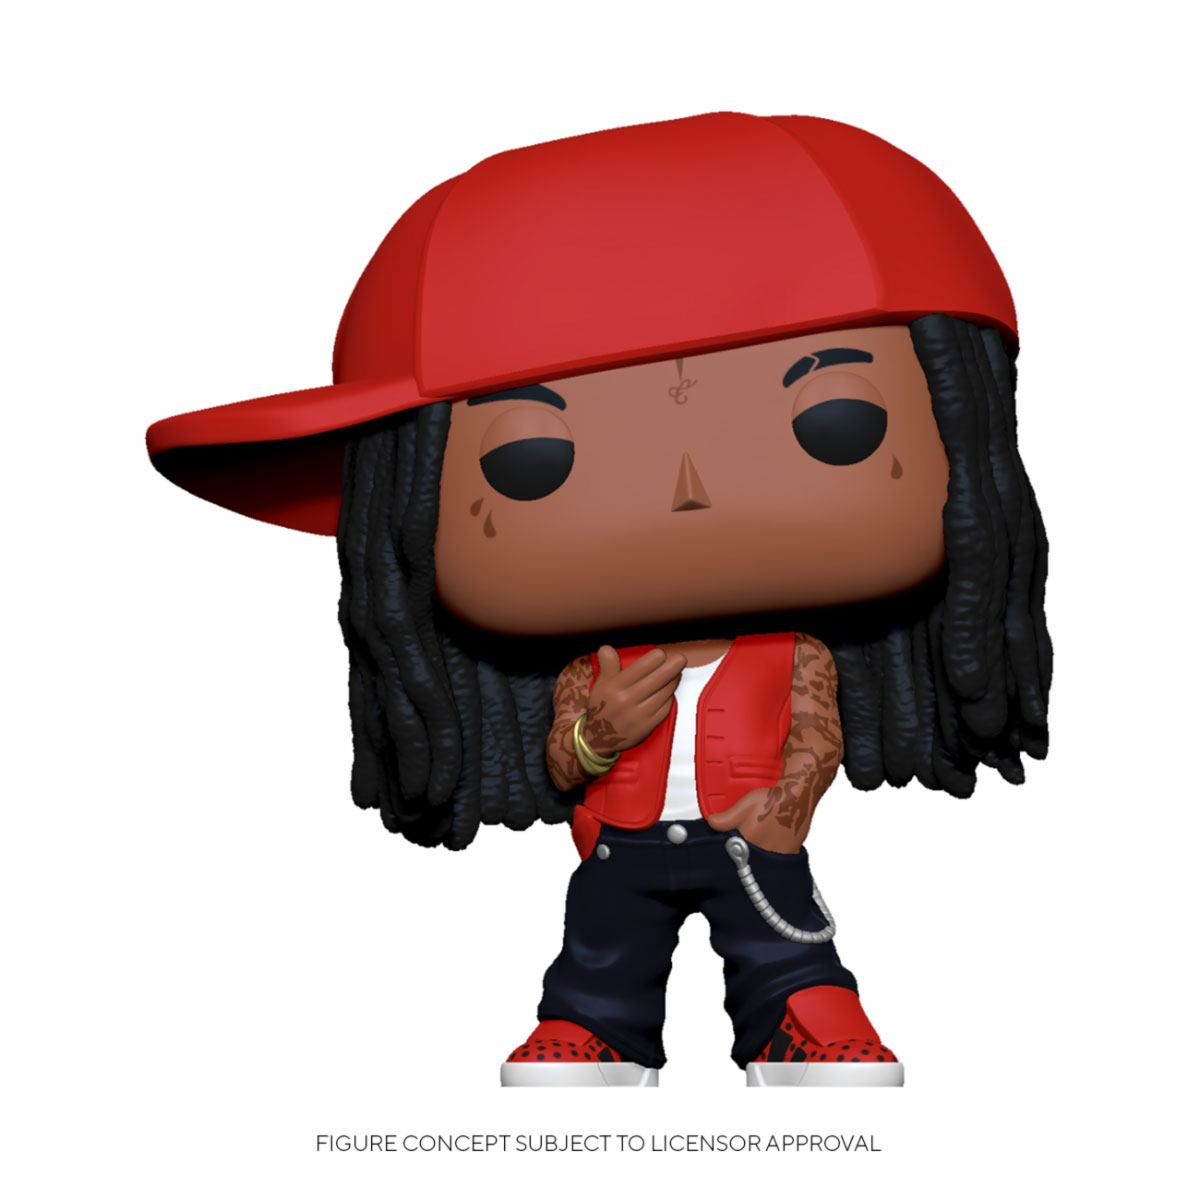 Lil Wayne POP! Rocks Vinyl Figure 9 cm